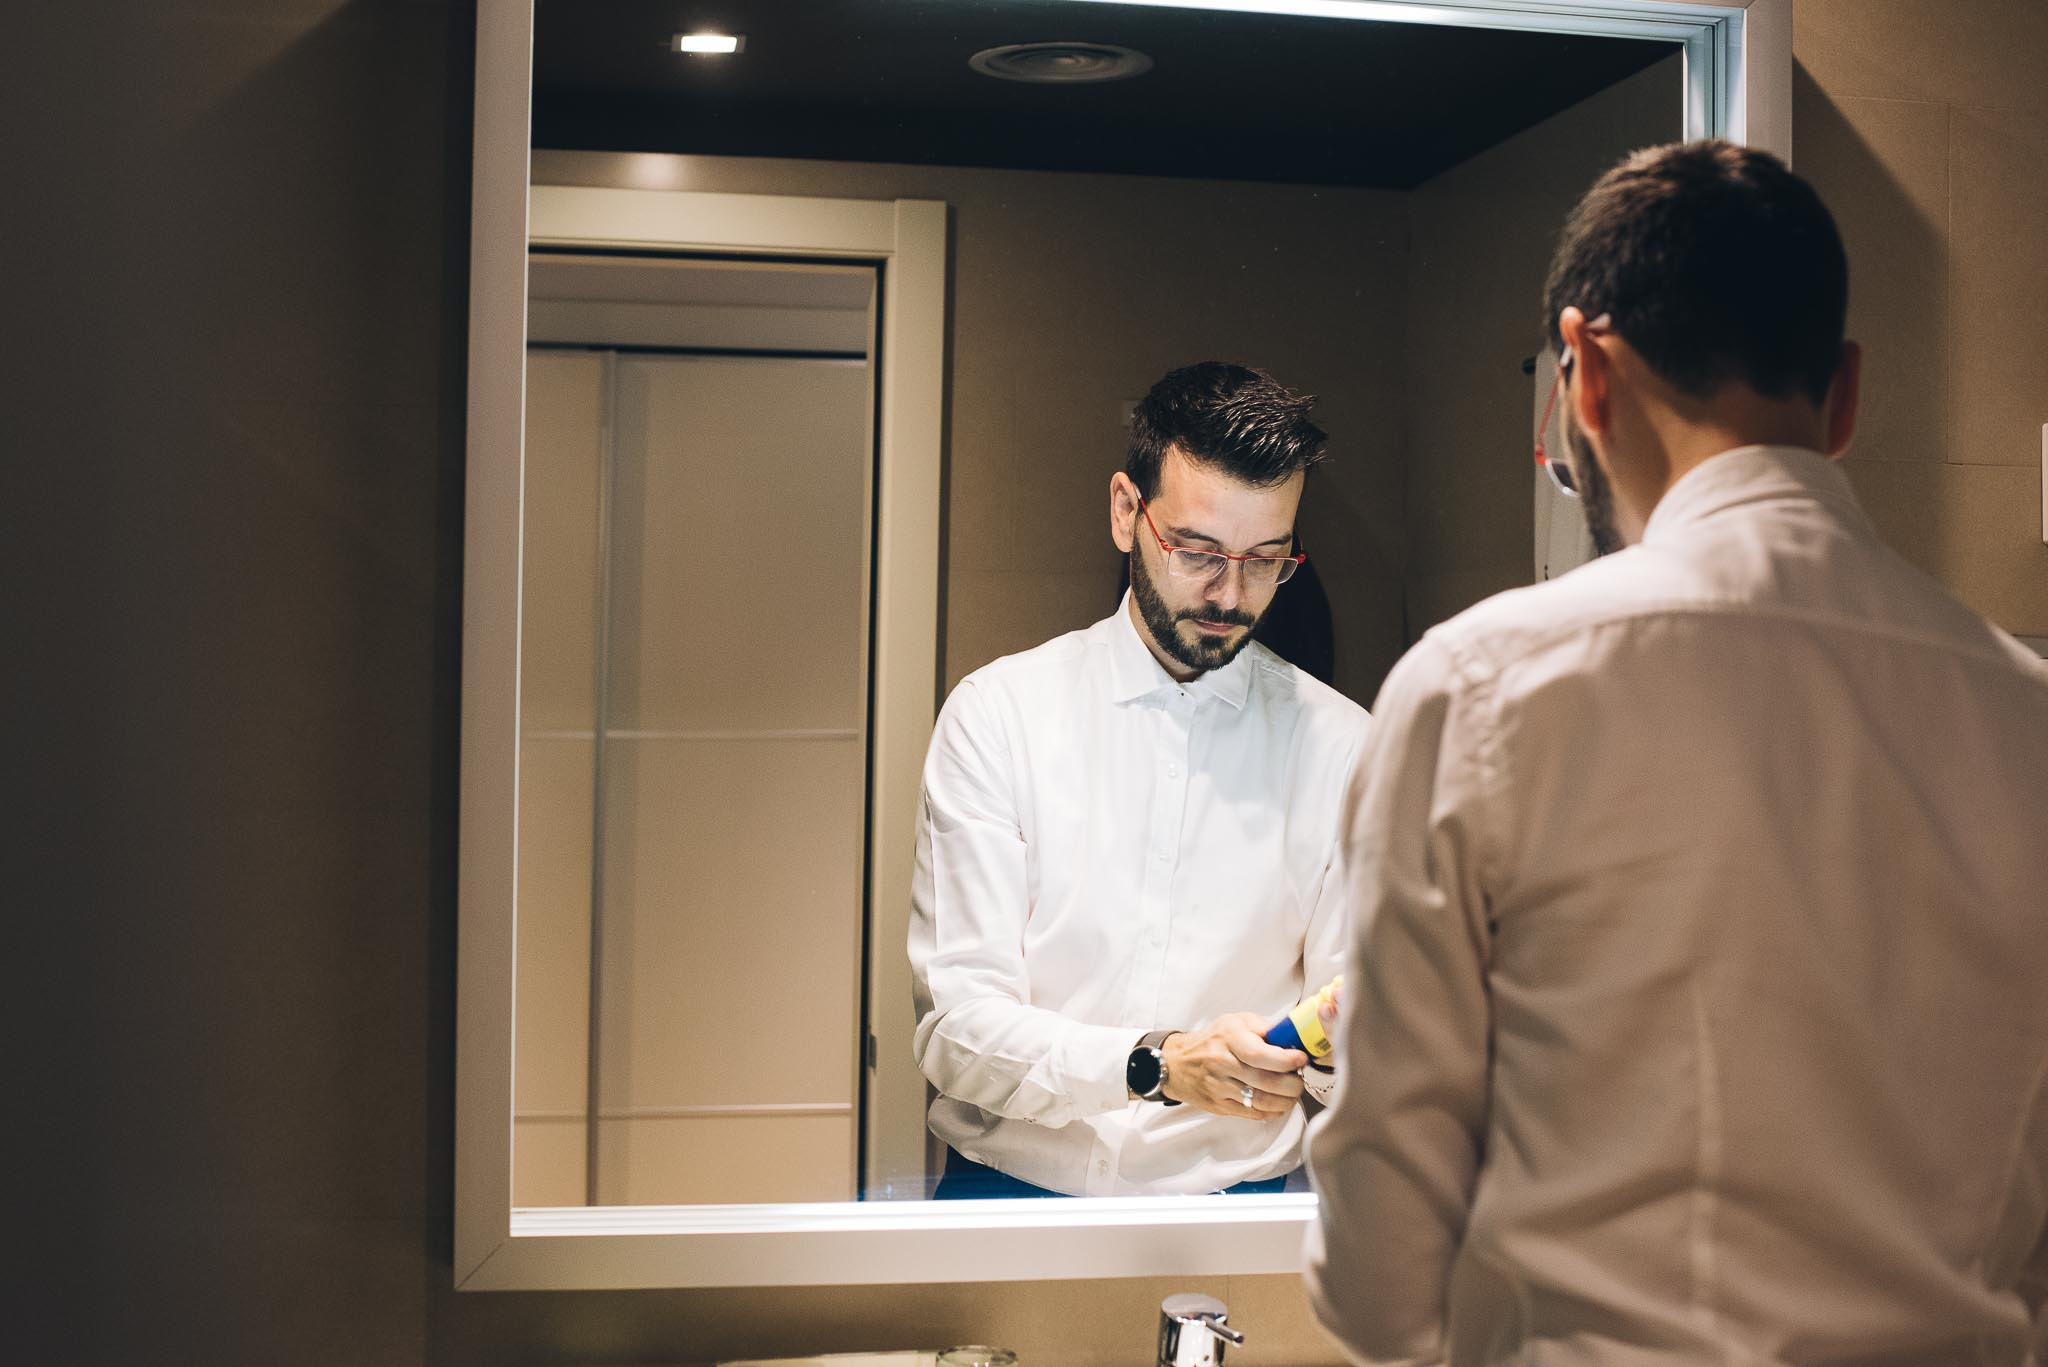 fotoperiodismo-laura-arroyo-fotografia-de-boda-hotel-qgat-san-cugat-barcelona-13